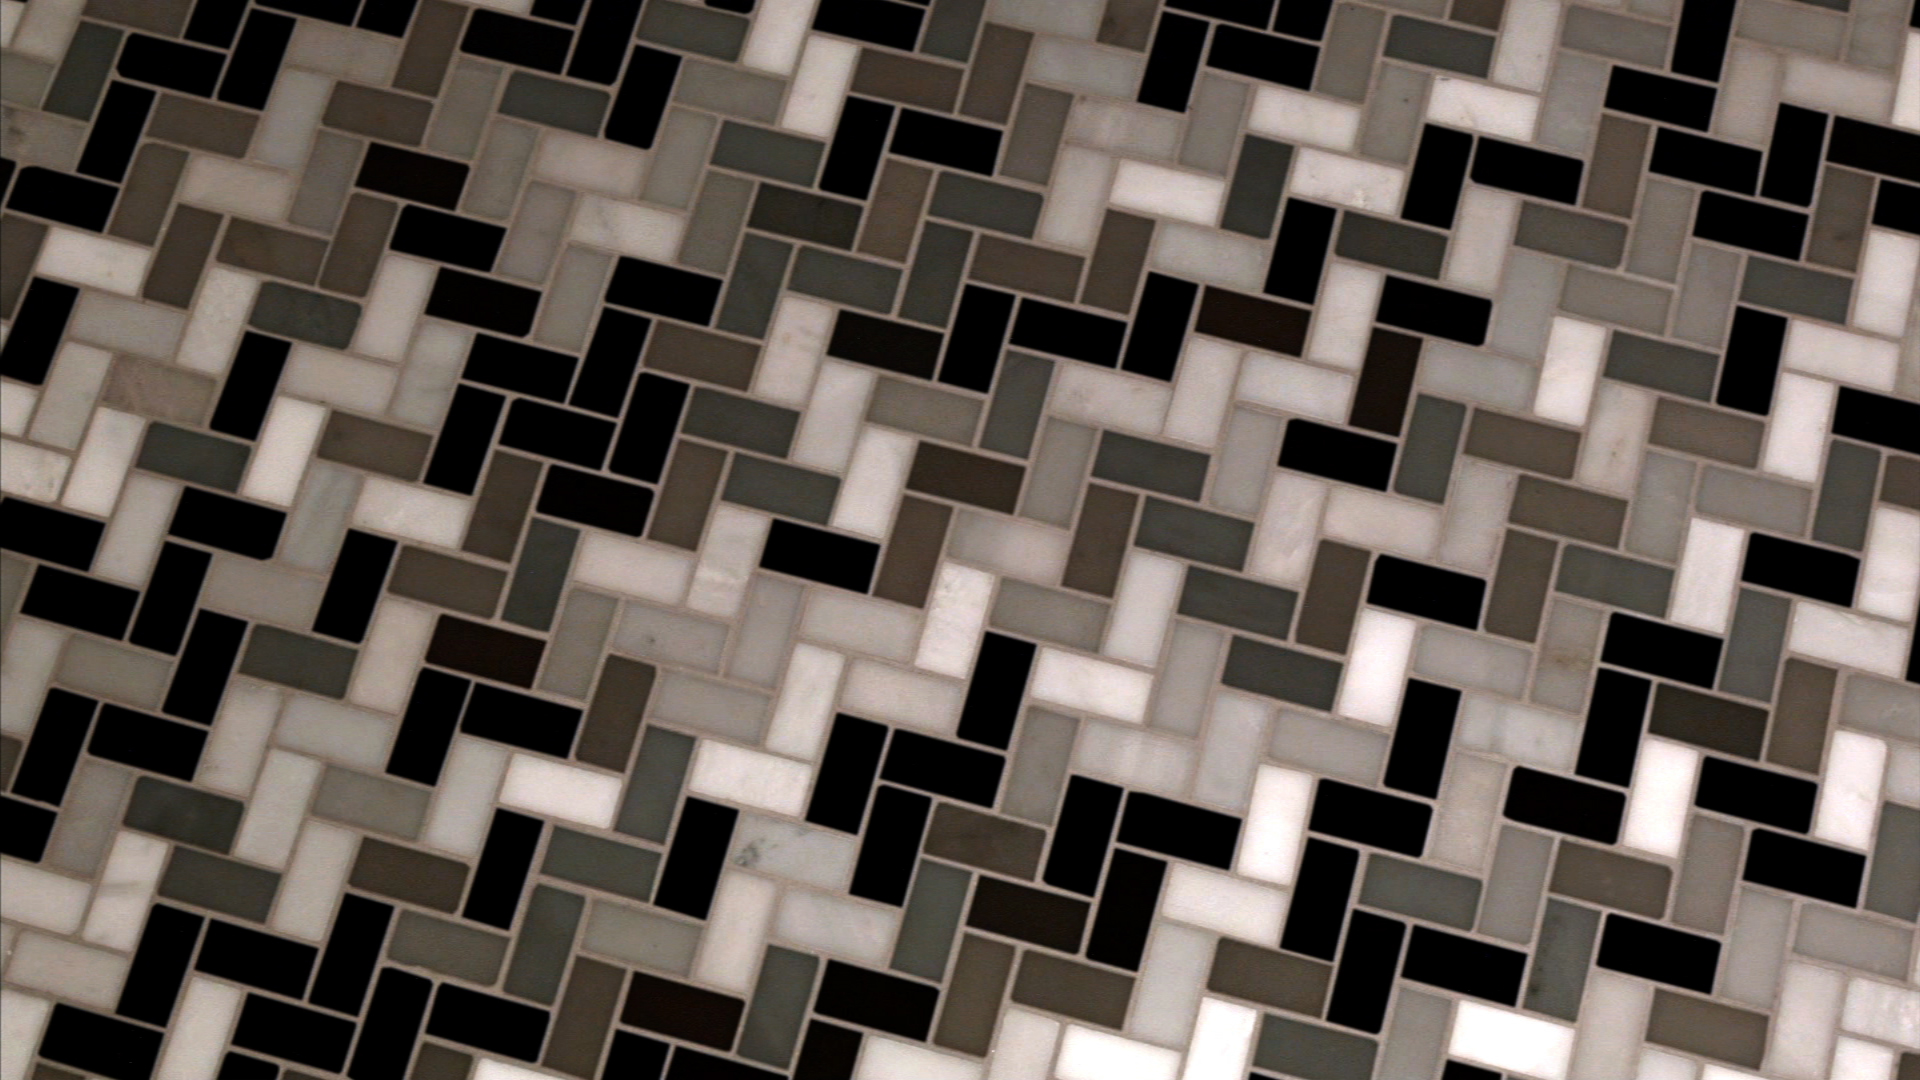 Noah Klersfeld Percussive Lights with Bathroom Floor #7 HD Video 1920 x 1080 5 min., edition of 5 2014